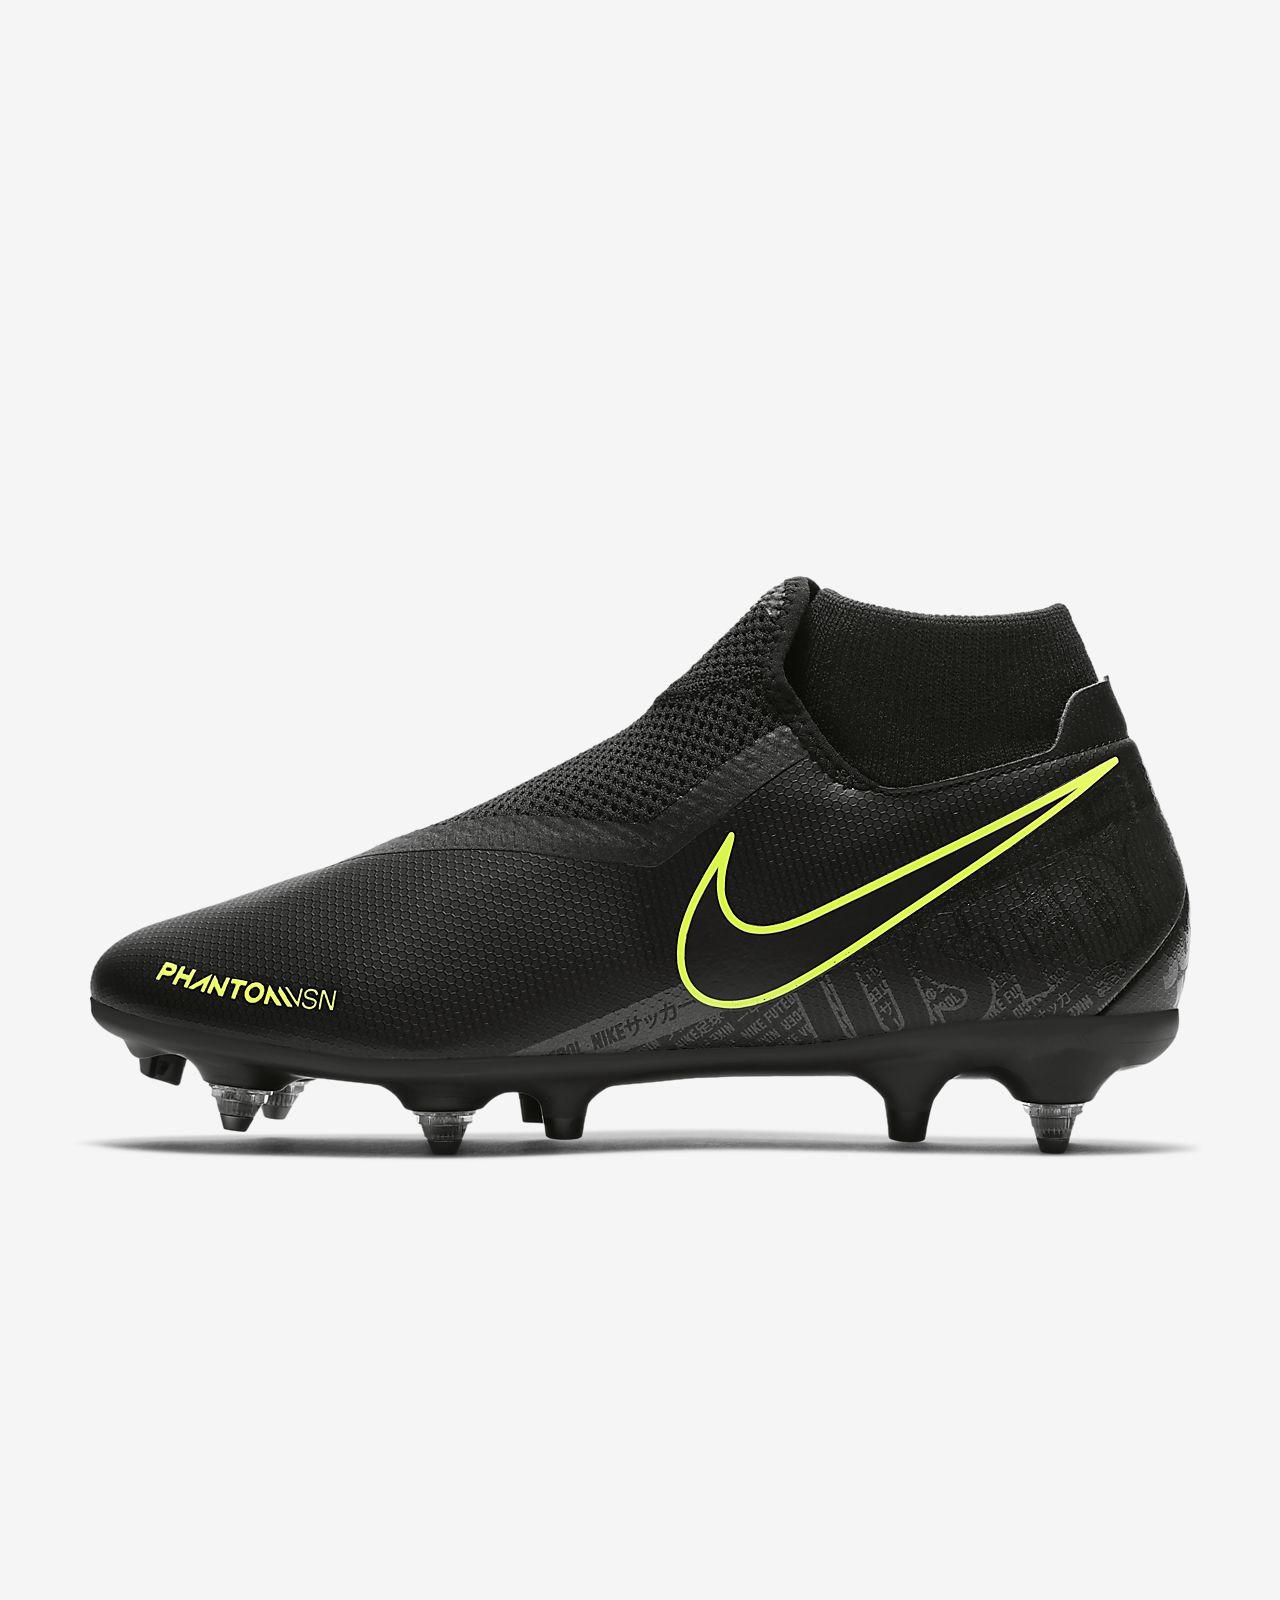 Nike PhantomVSN Academy Dynamic Fit SG-Pro Anti-Clog Traction Yumuşak Zemin Kramponu